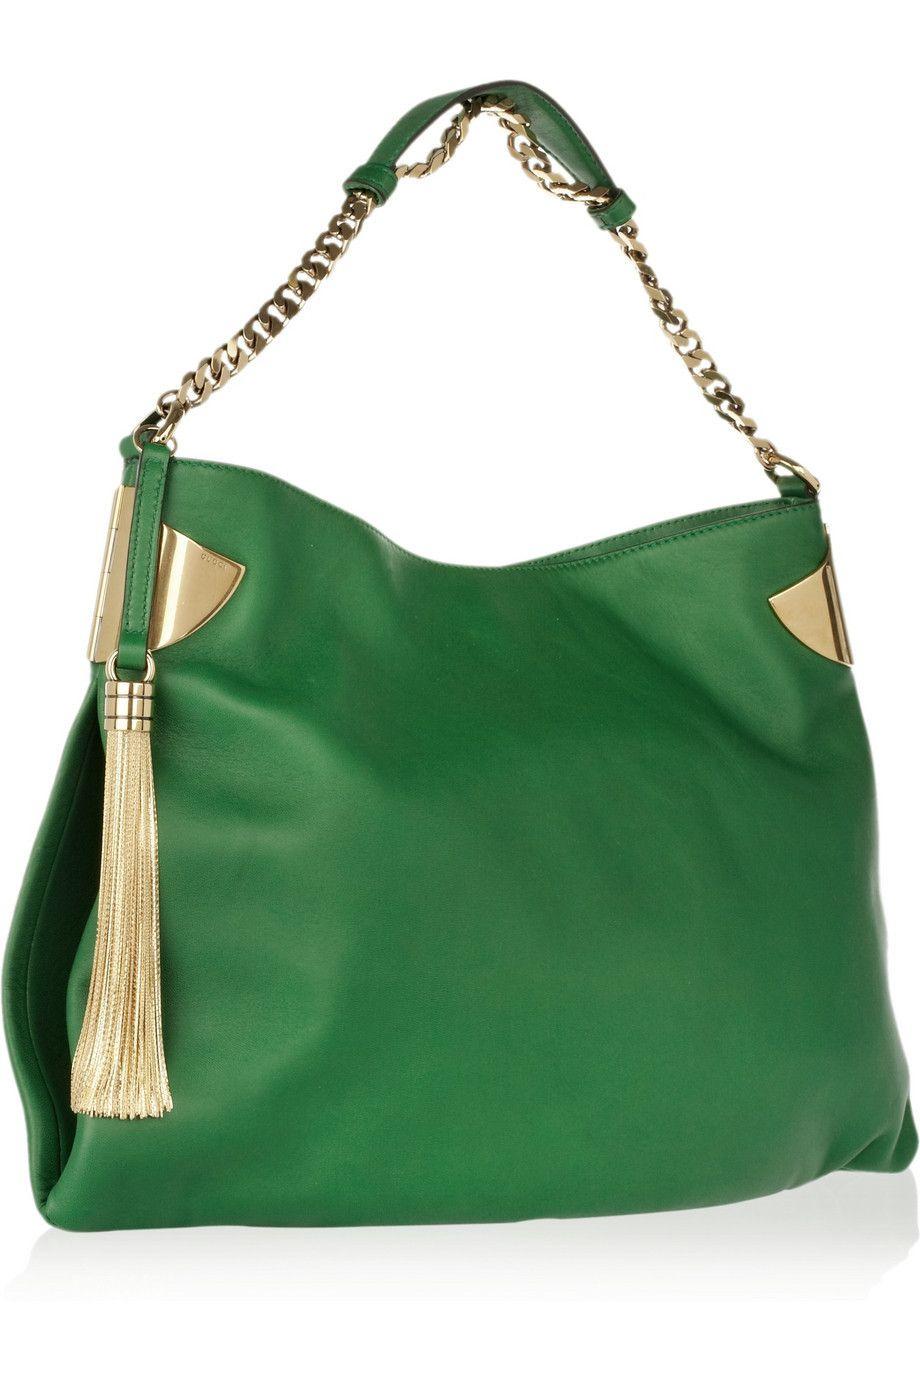 Gucci 1970 Small Leather Shoulder Bag Net A Porter Com